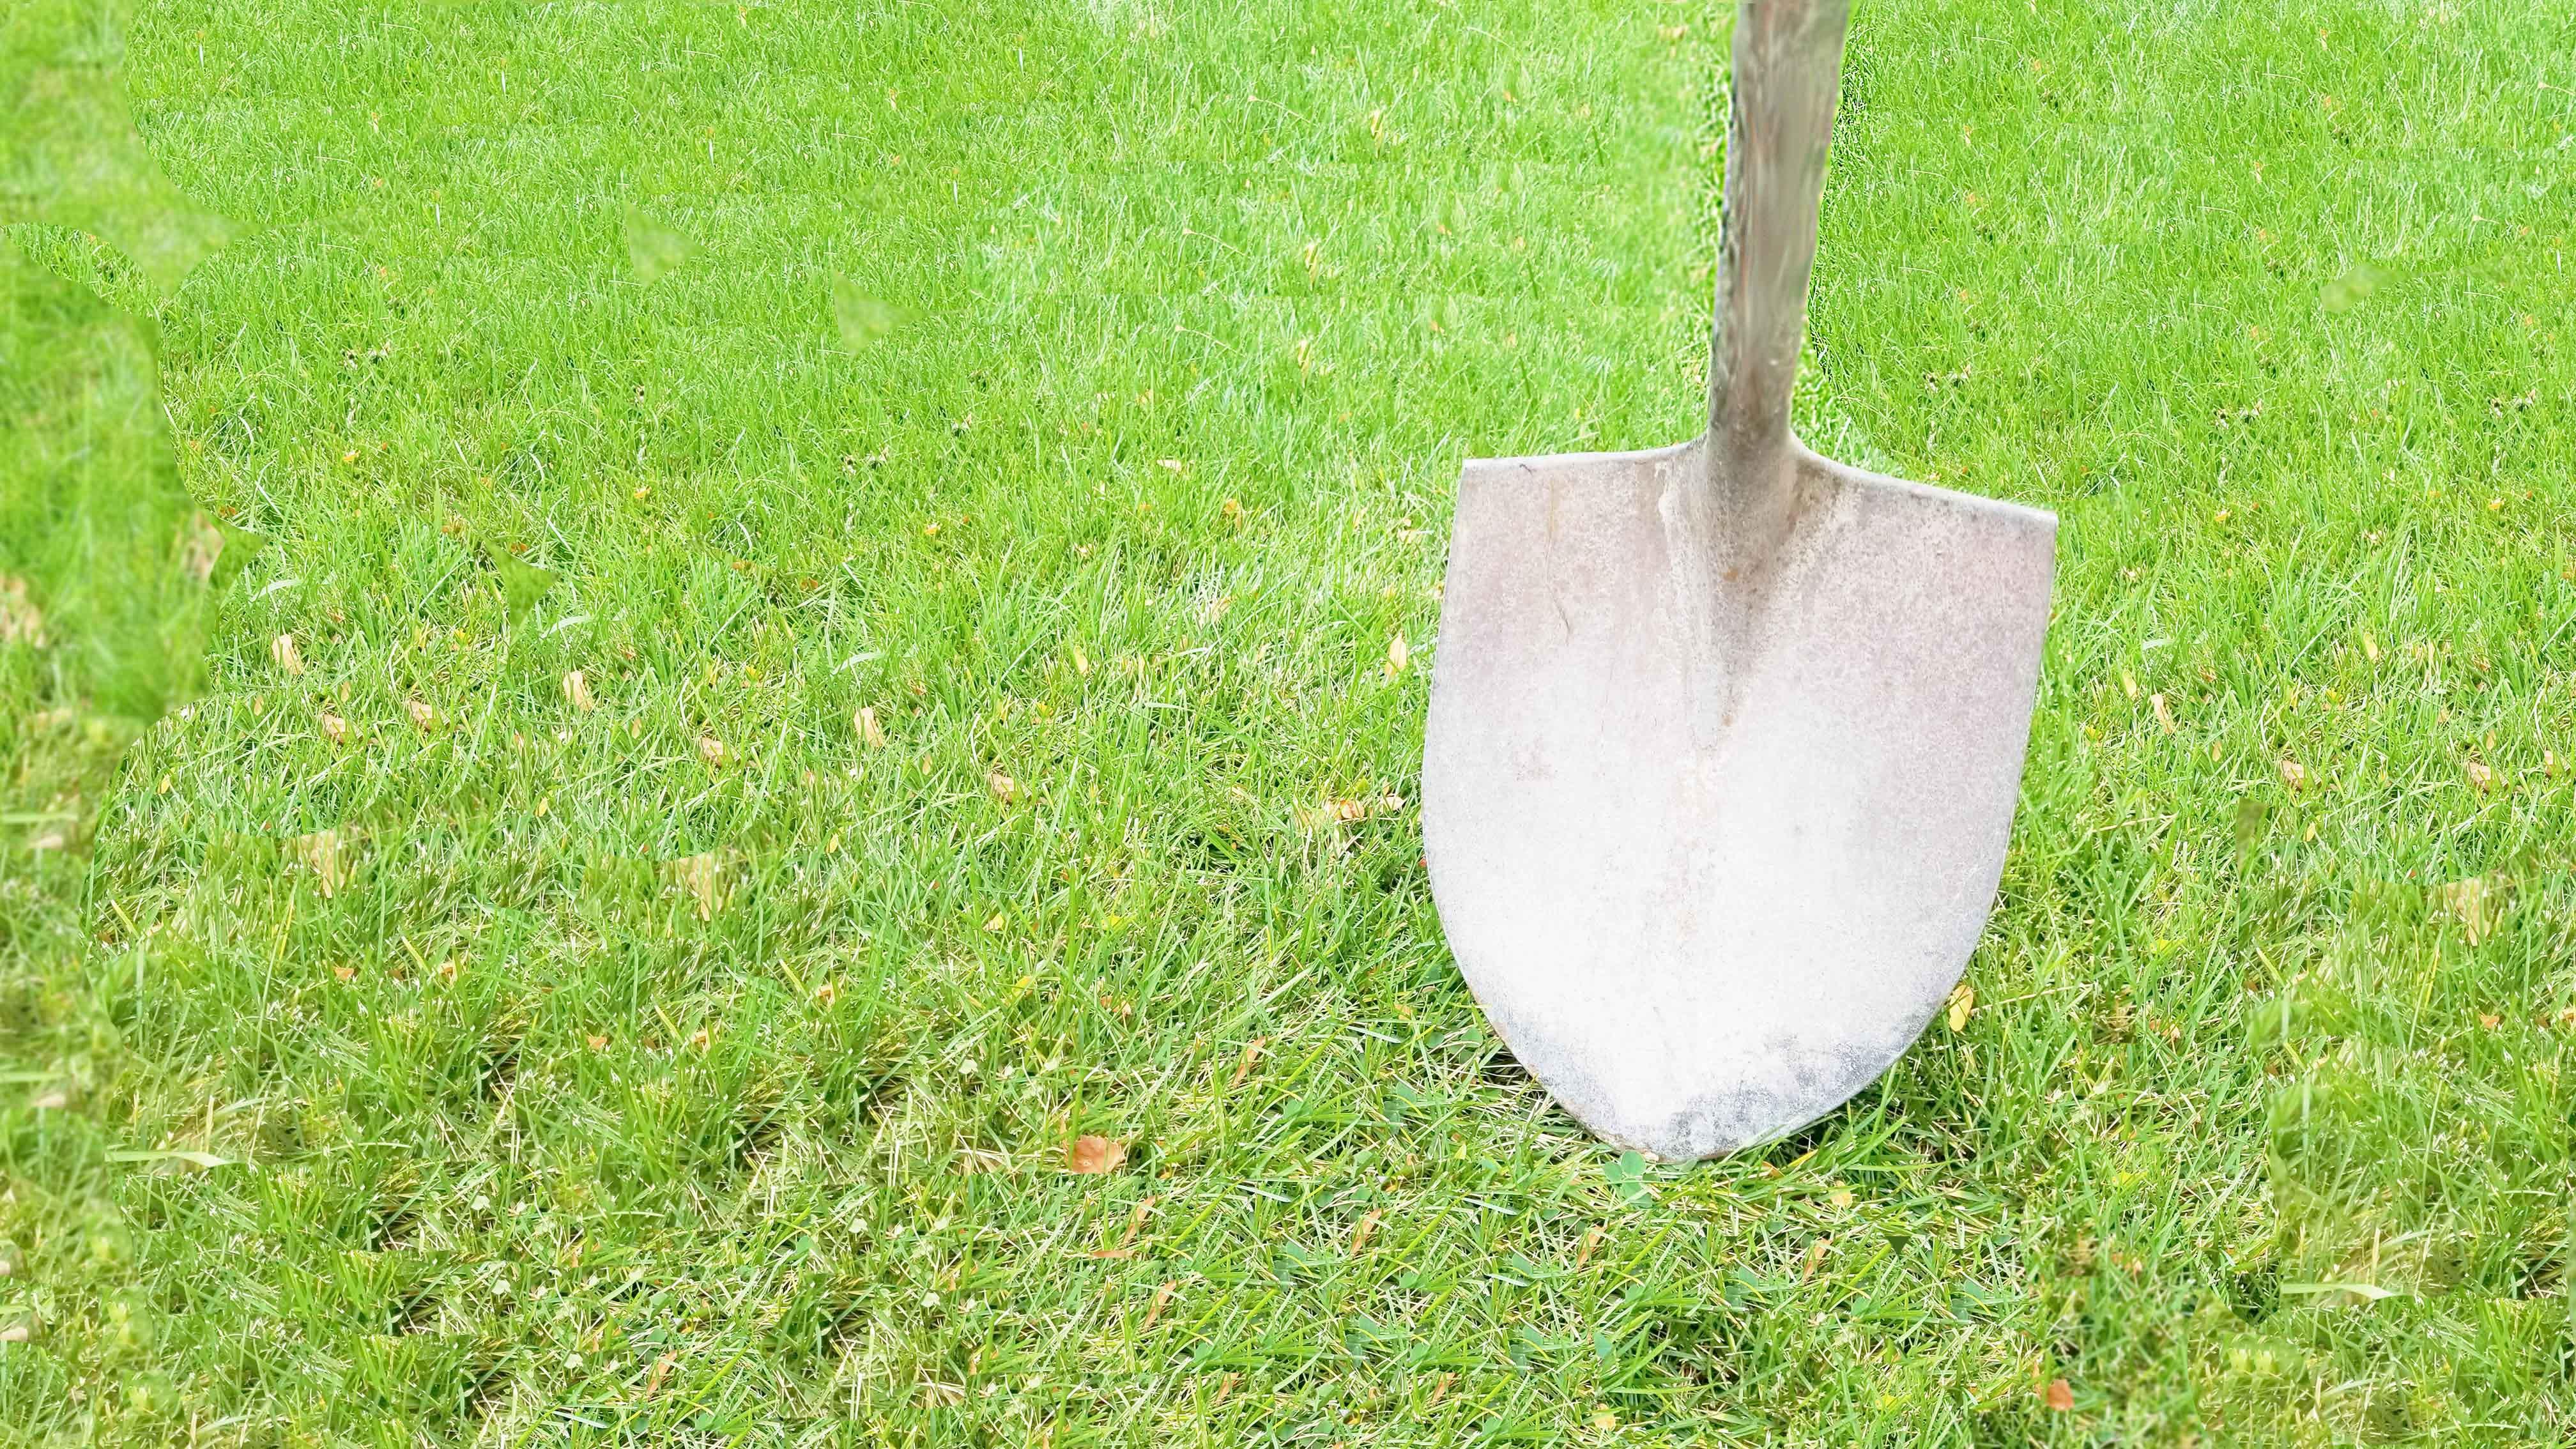 Shovel Hitting Grass - Groundbreaking Innovations in Testing History